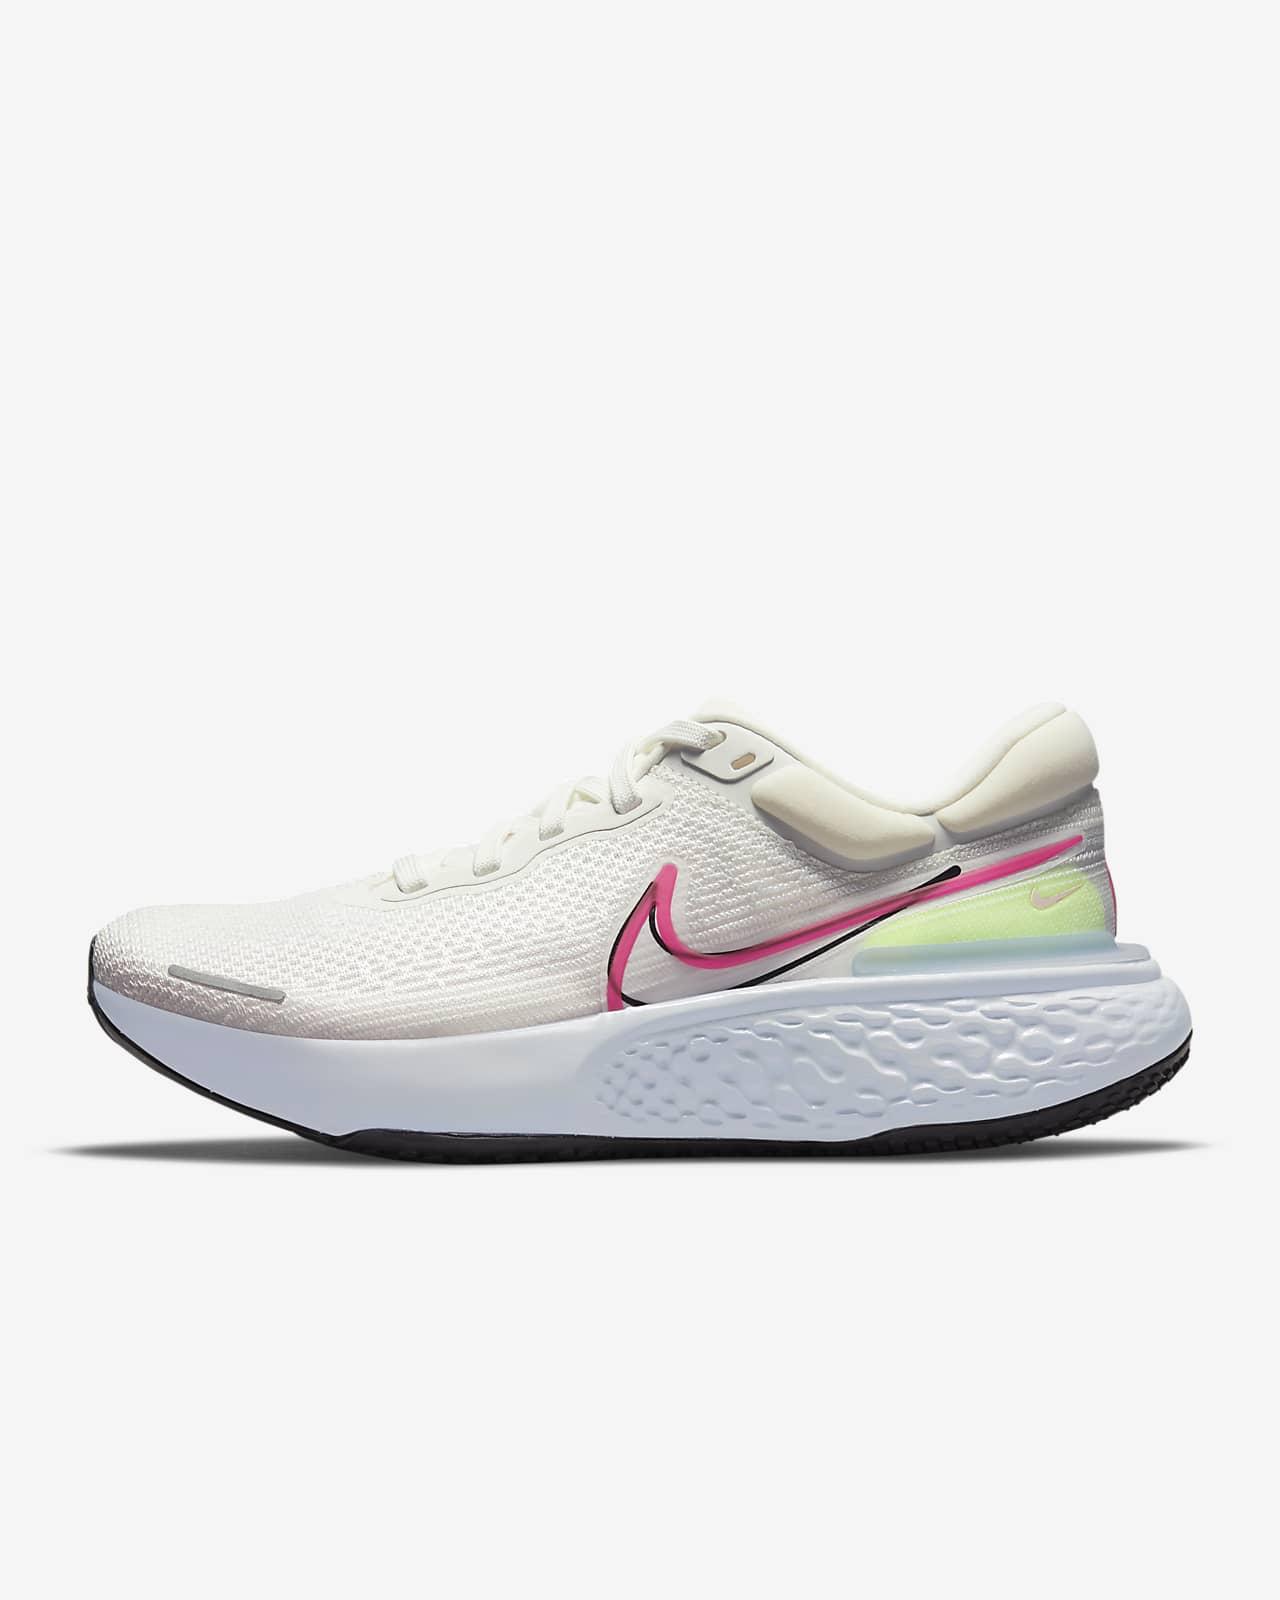 Мужские беговые кроссовки Nike ZoomX Invincible Run Flyknit